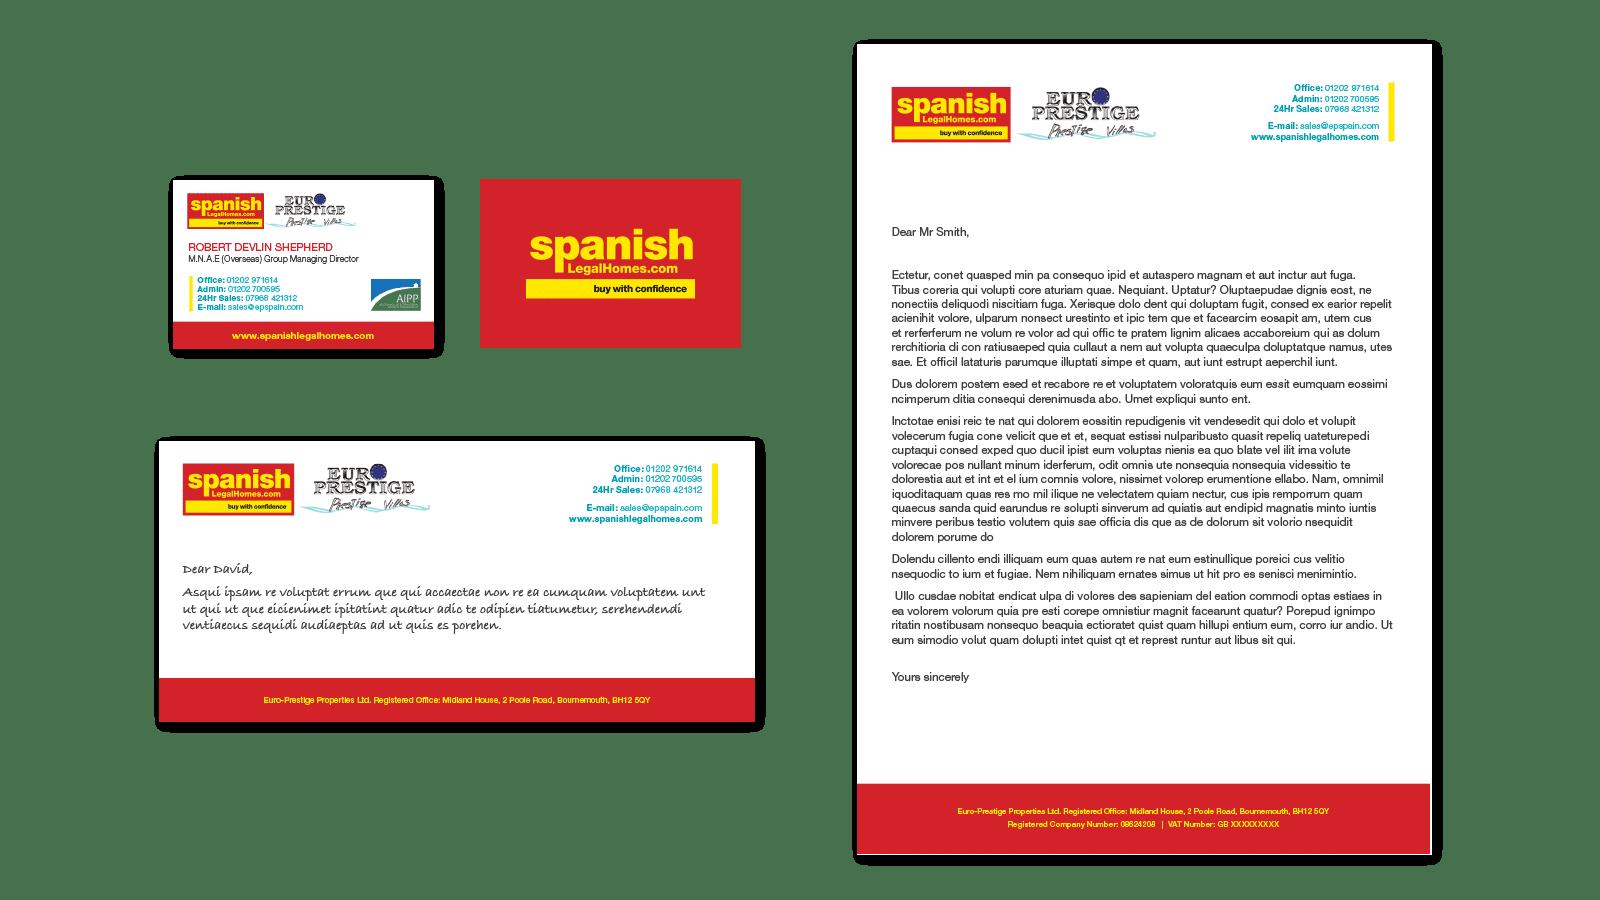 Spanish Legal Homes stationary